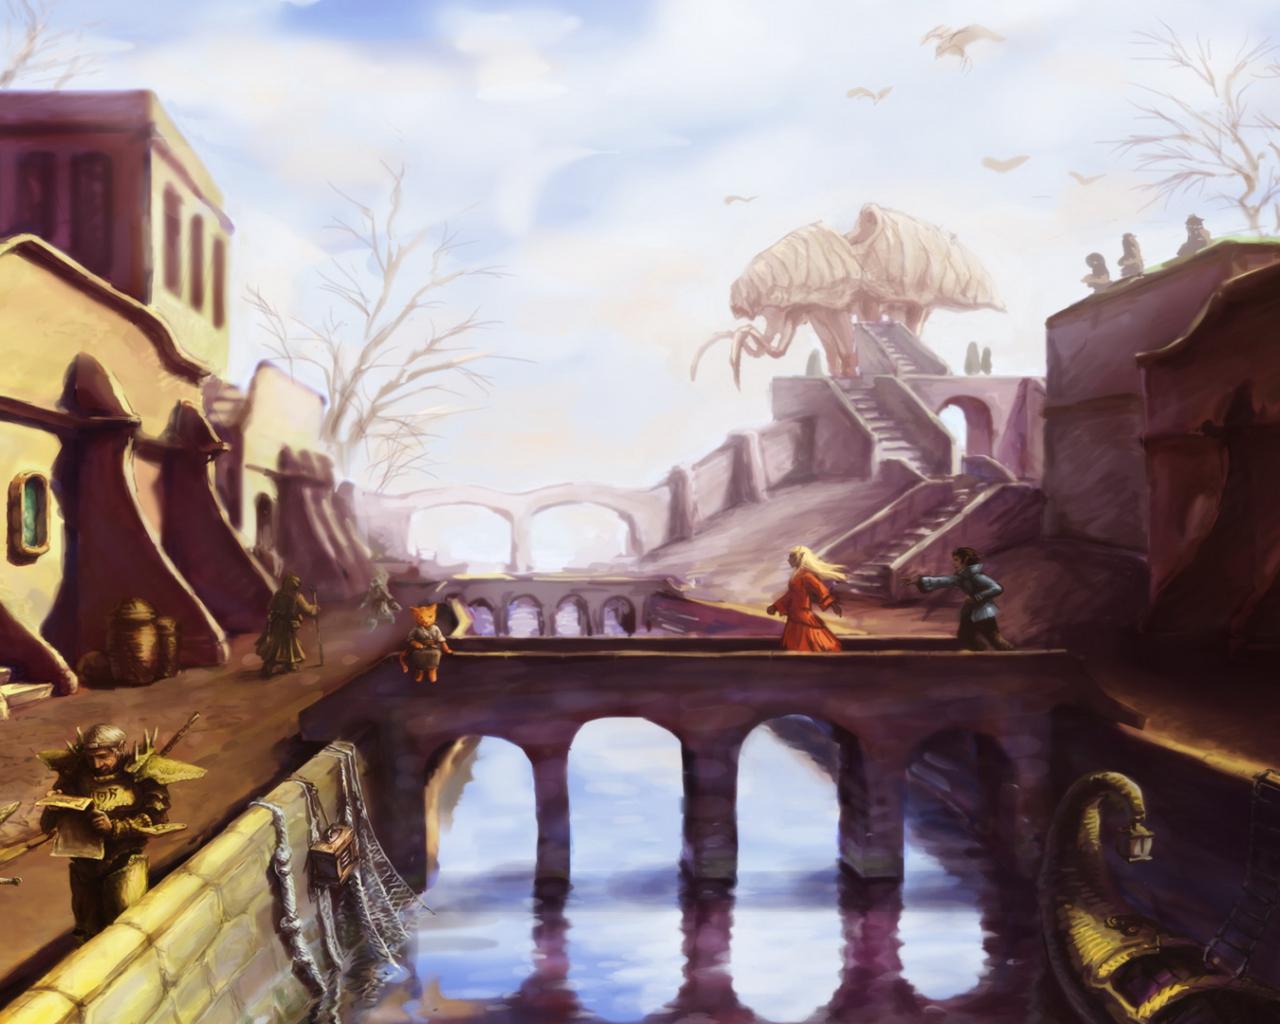 Free Download Pc Game Wallpapers Game Hd Wallpapers Full Hd 1080p Morrowind 1920x1080 For Your Desktop Mobile Tablet Explore 77 Morrowind Wallpapers Elder Scrolls Oblivion Wallpaper Skyrim Imperial Wallpaper